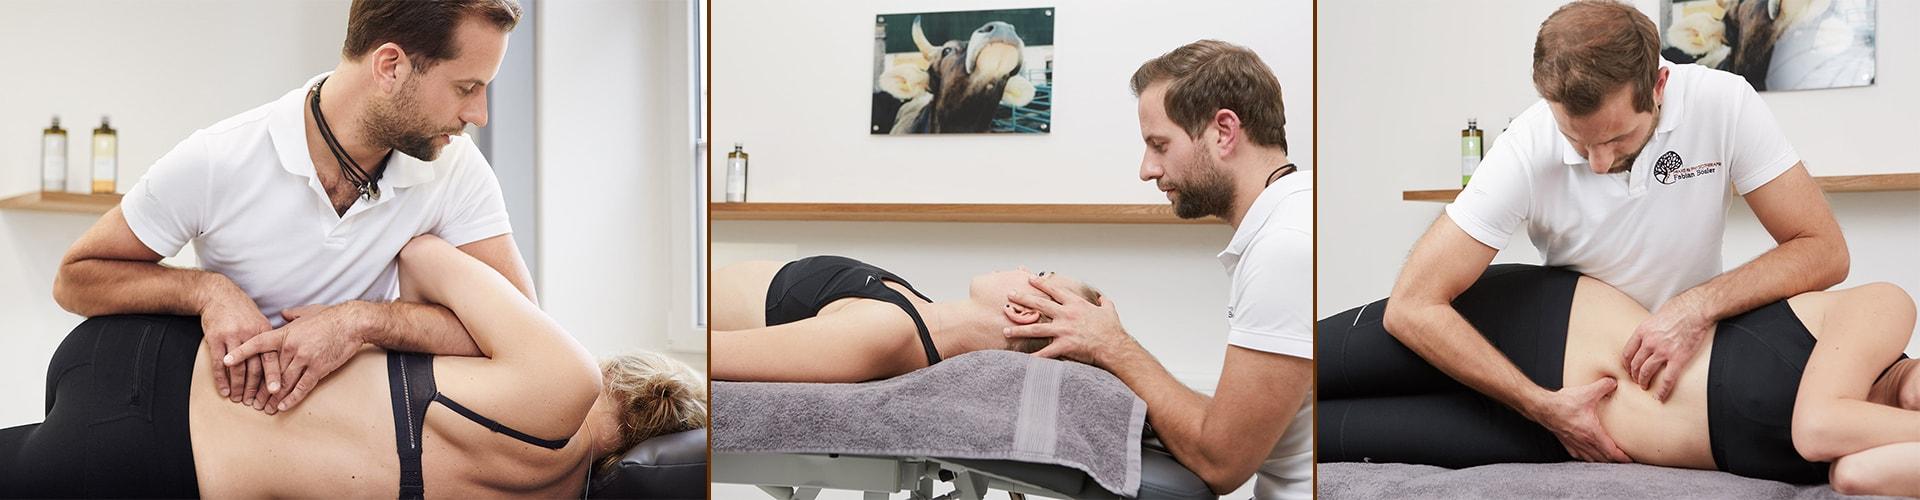 Osteopathie Behandlung Untermeitingen, Schwabmünchen, Lechfeld